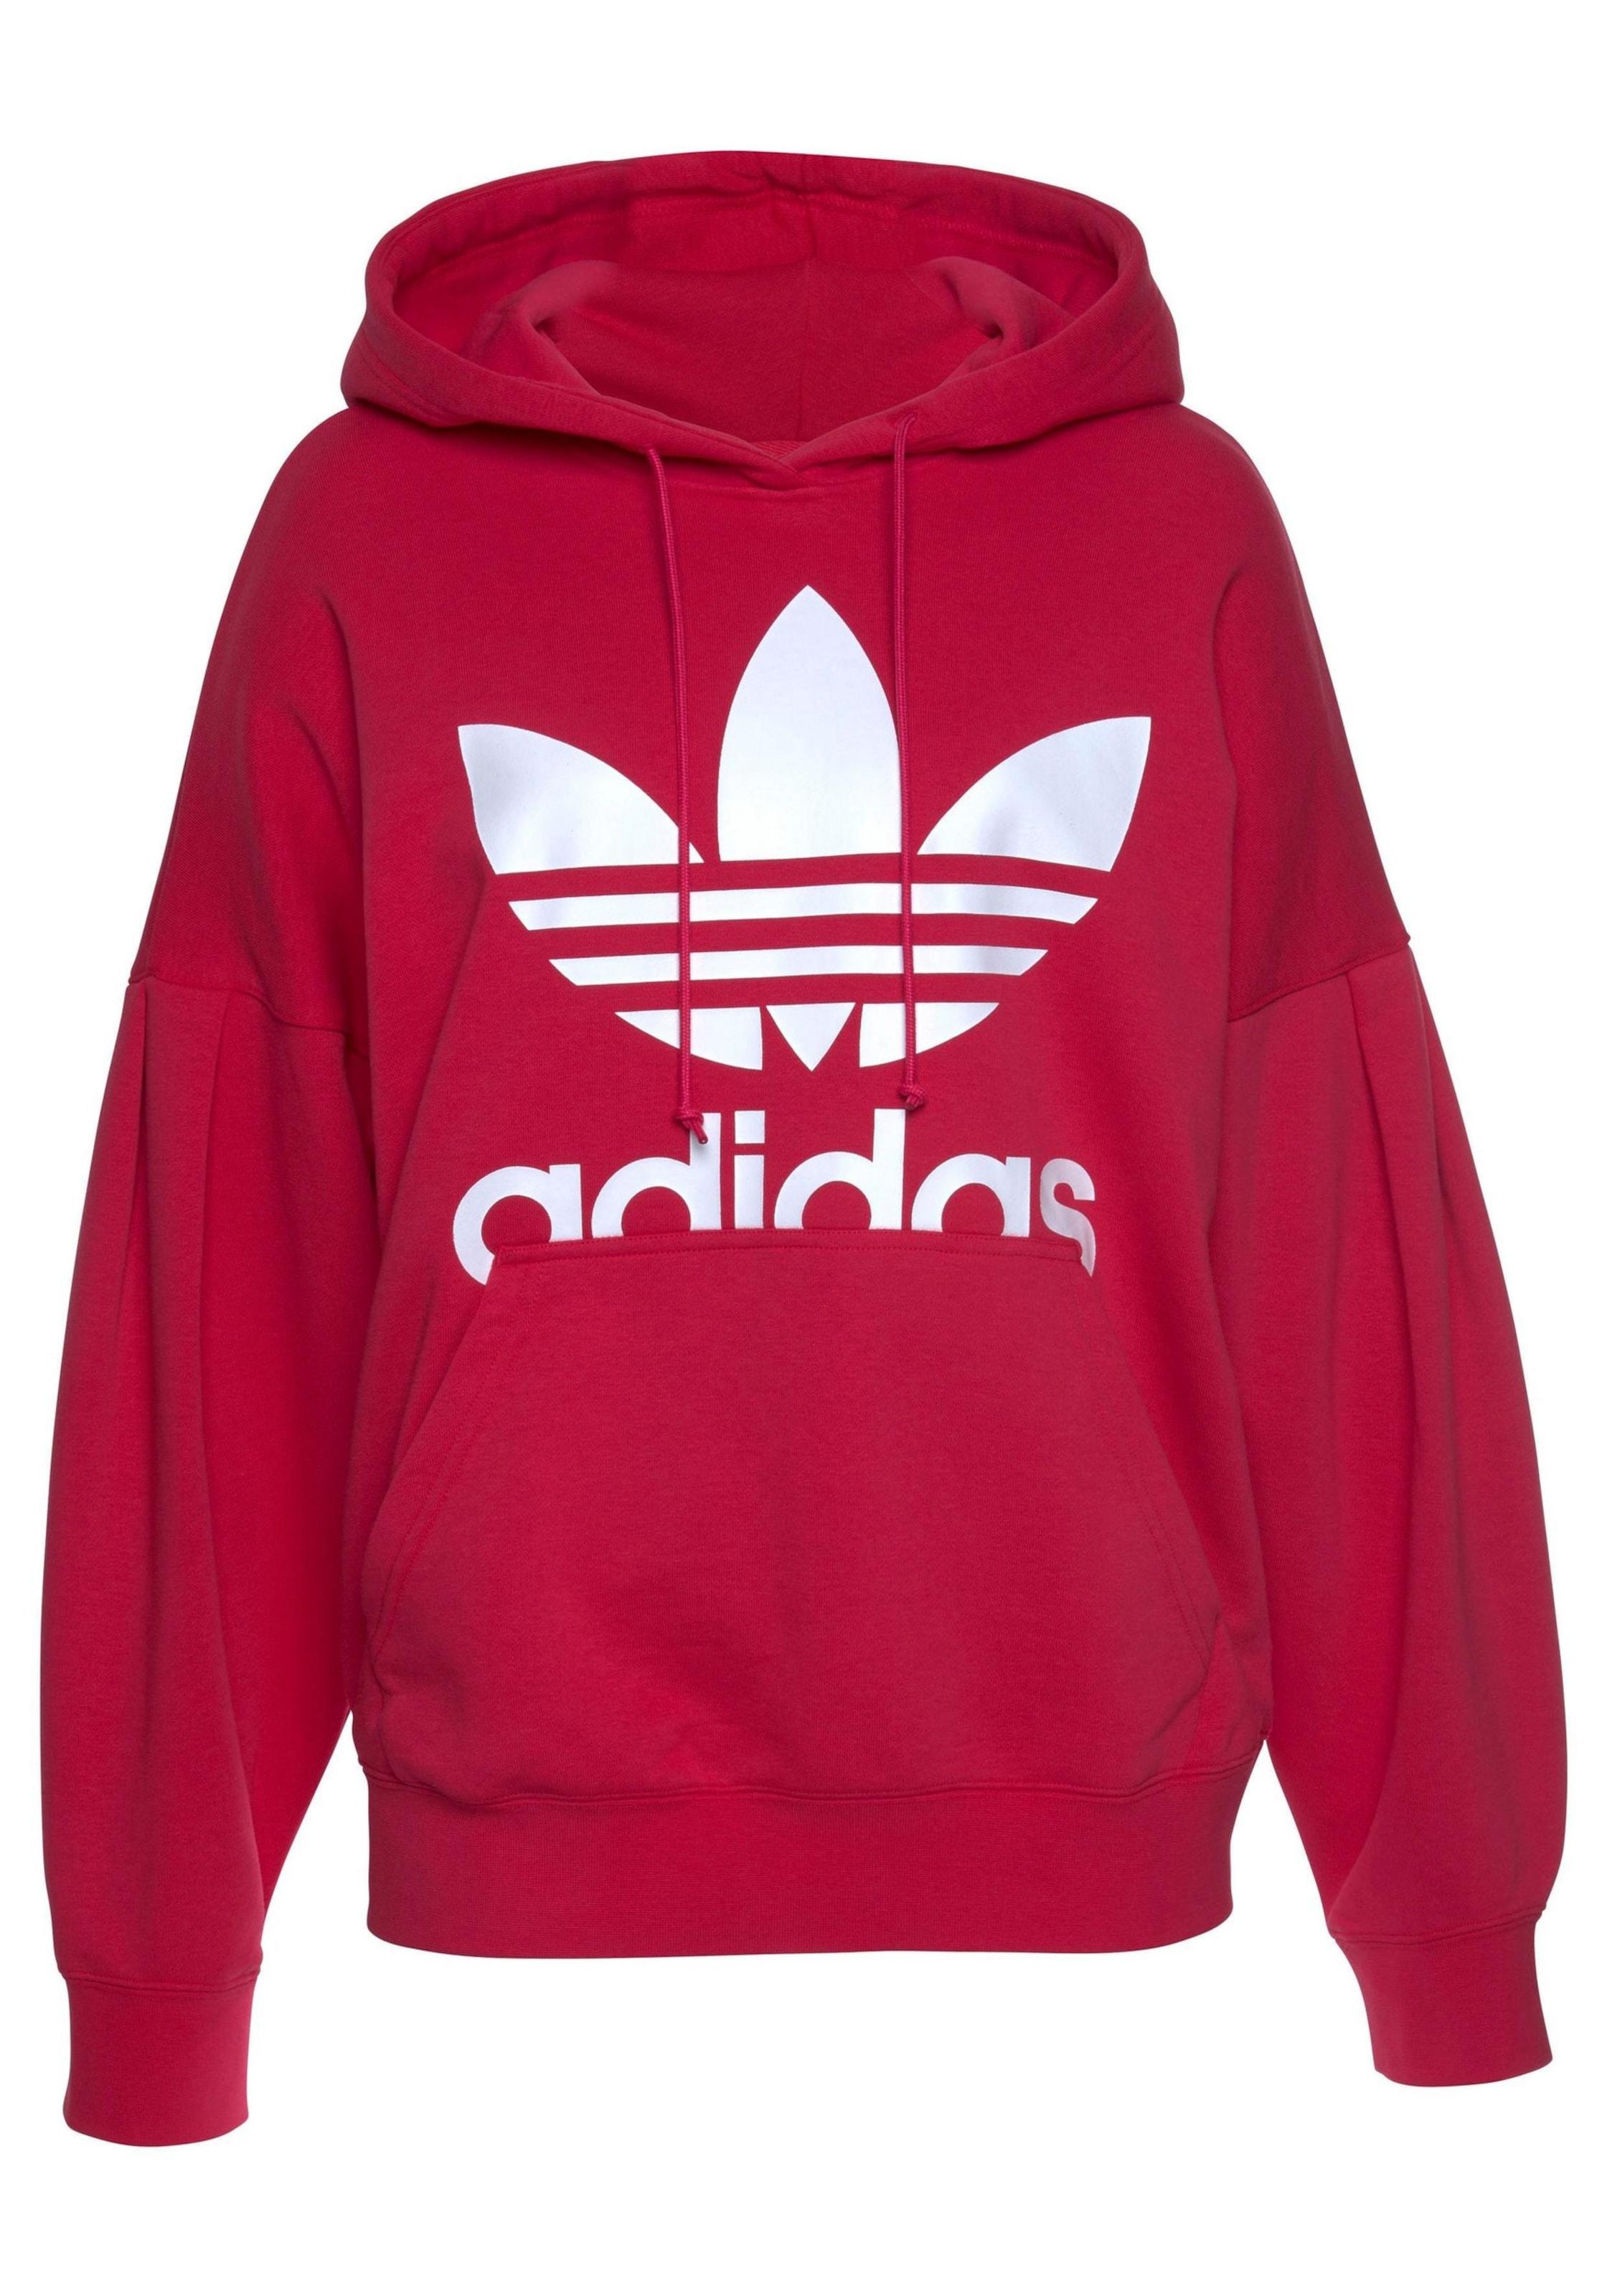 Adidas Kapuzensweatshirt Originals Originals PinkWeiß In Adidas Kapuzensweatshirt In PinkWeiß Adidas v8nOym0PNw